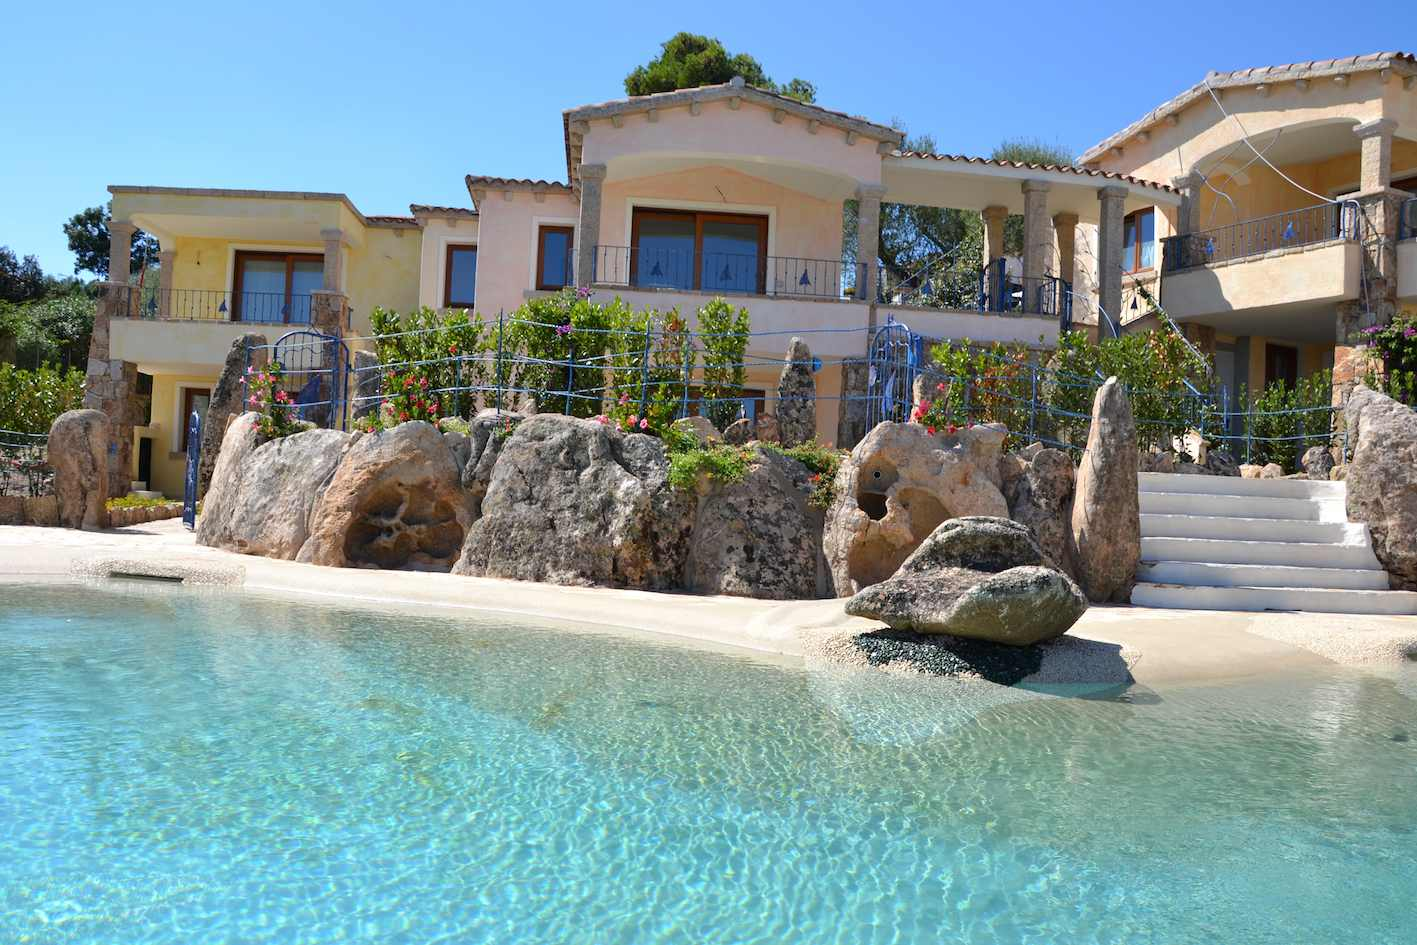 Ville Affitto Vacanze Toscana Mare